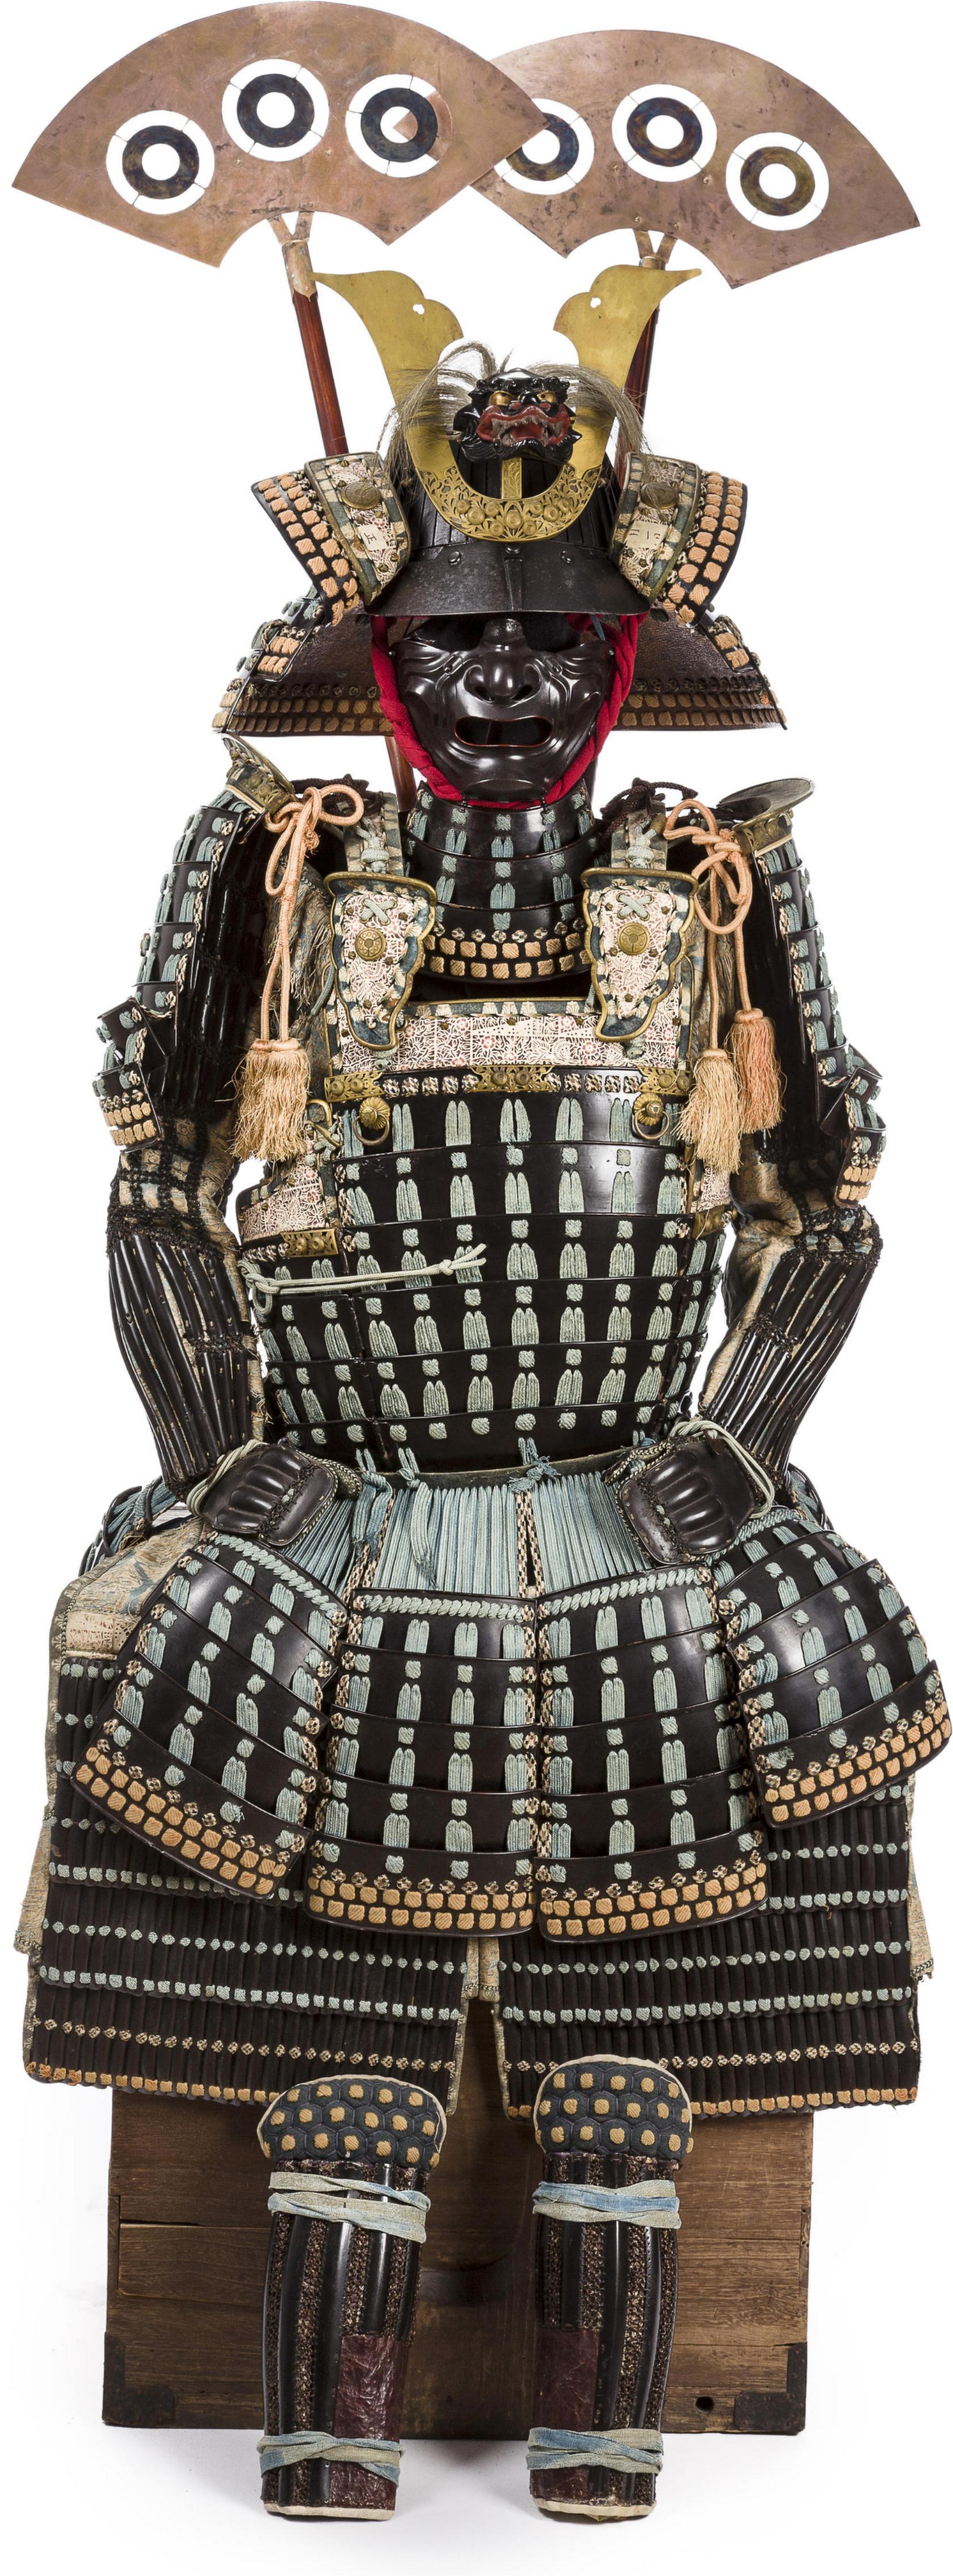 48 Plate Suji Bachi Kabuto Helmet Mogami Do Dou Cuirass Gusoku Suit Of Armor Kabuto By Myochin Munehisa Late Murom Samurai Armor Armor Ancient Armor